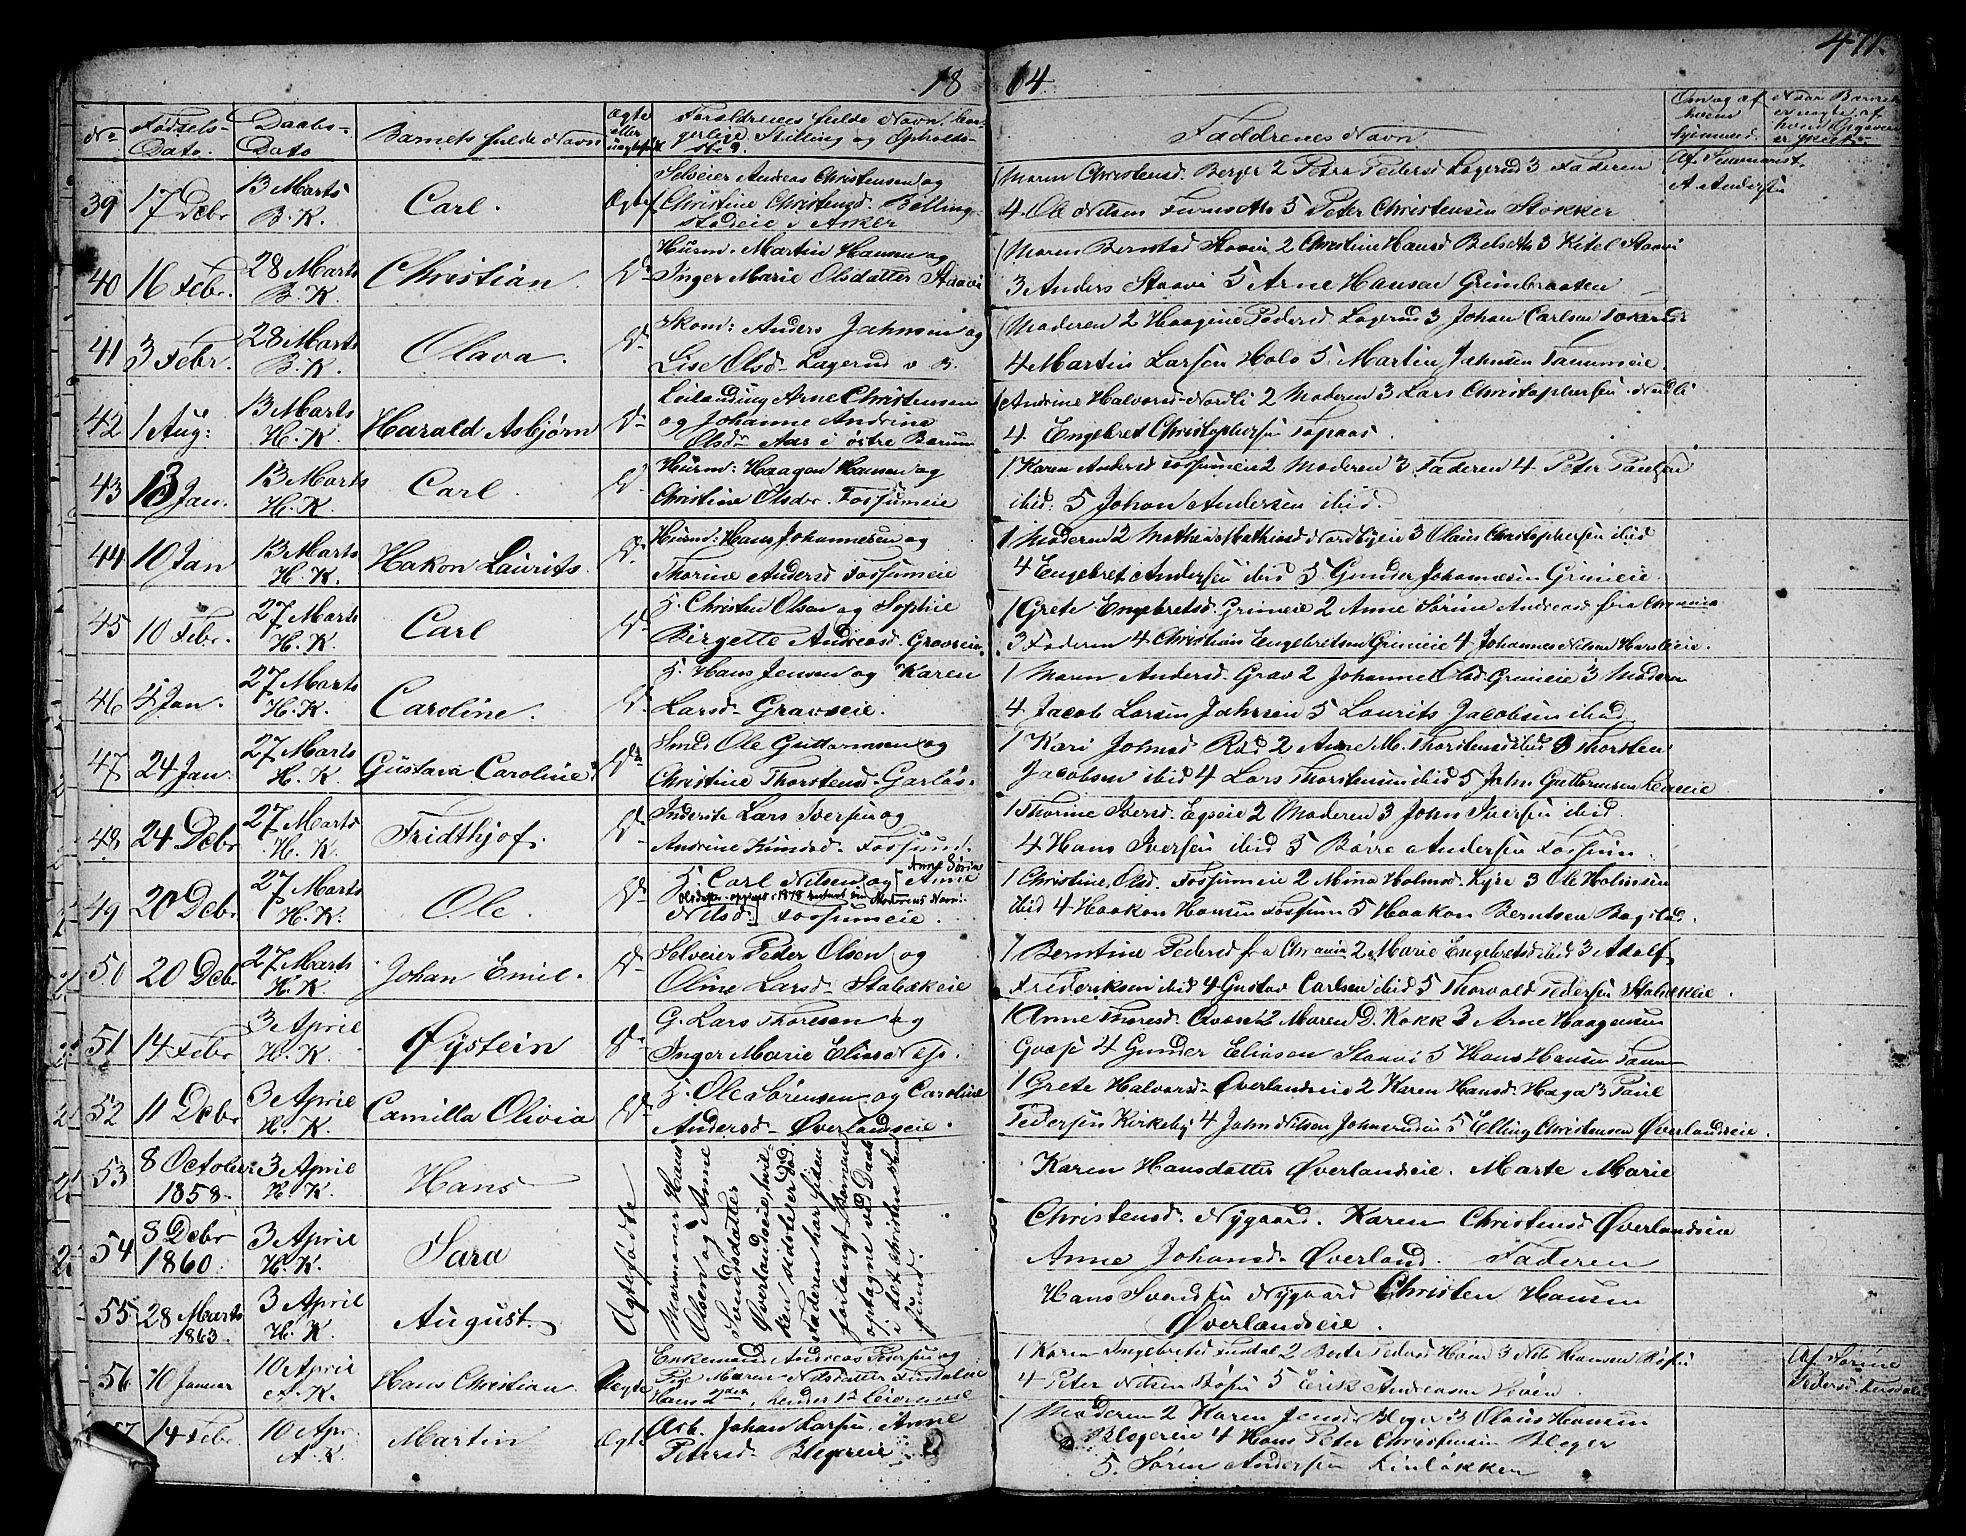 SAO, Asker prestekontor Kirkebøker, F/Fa/L0007: Parish register (official) no. I 7, 1825-1864, p. 471